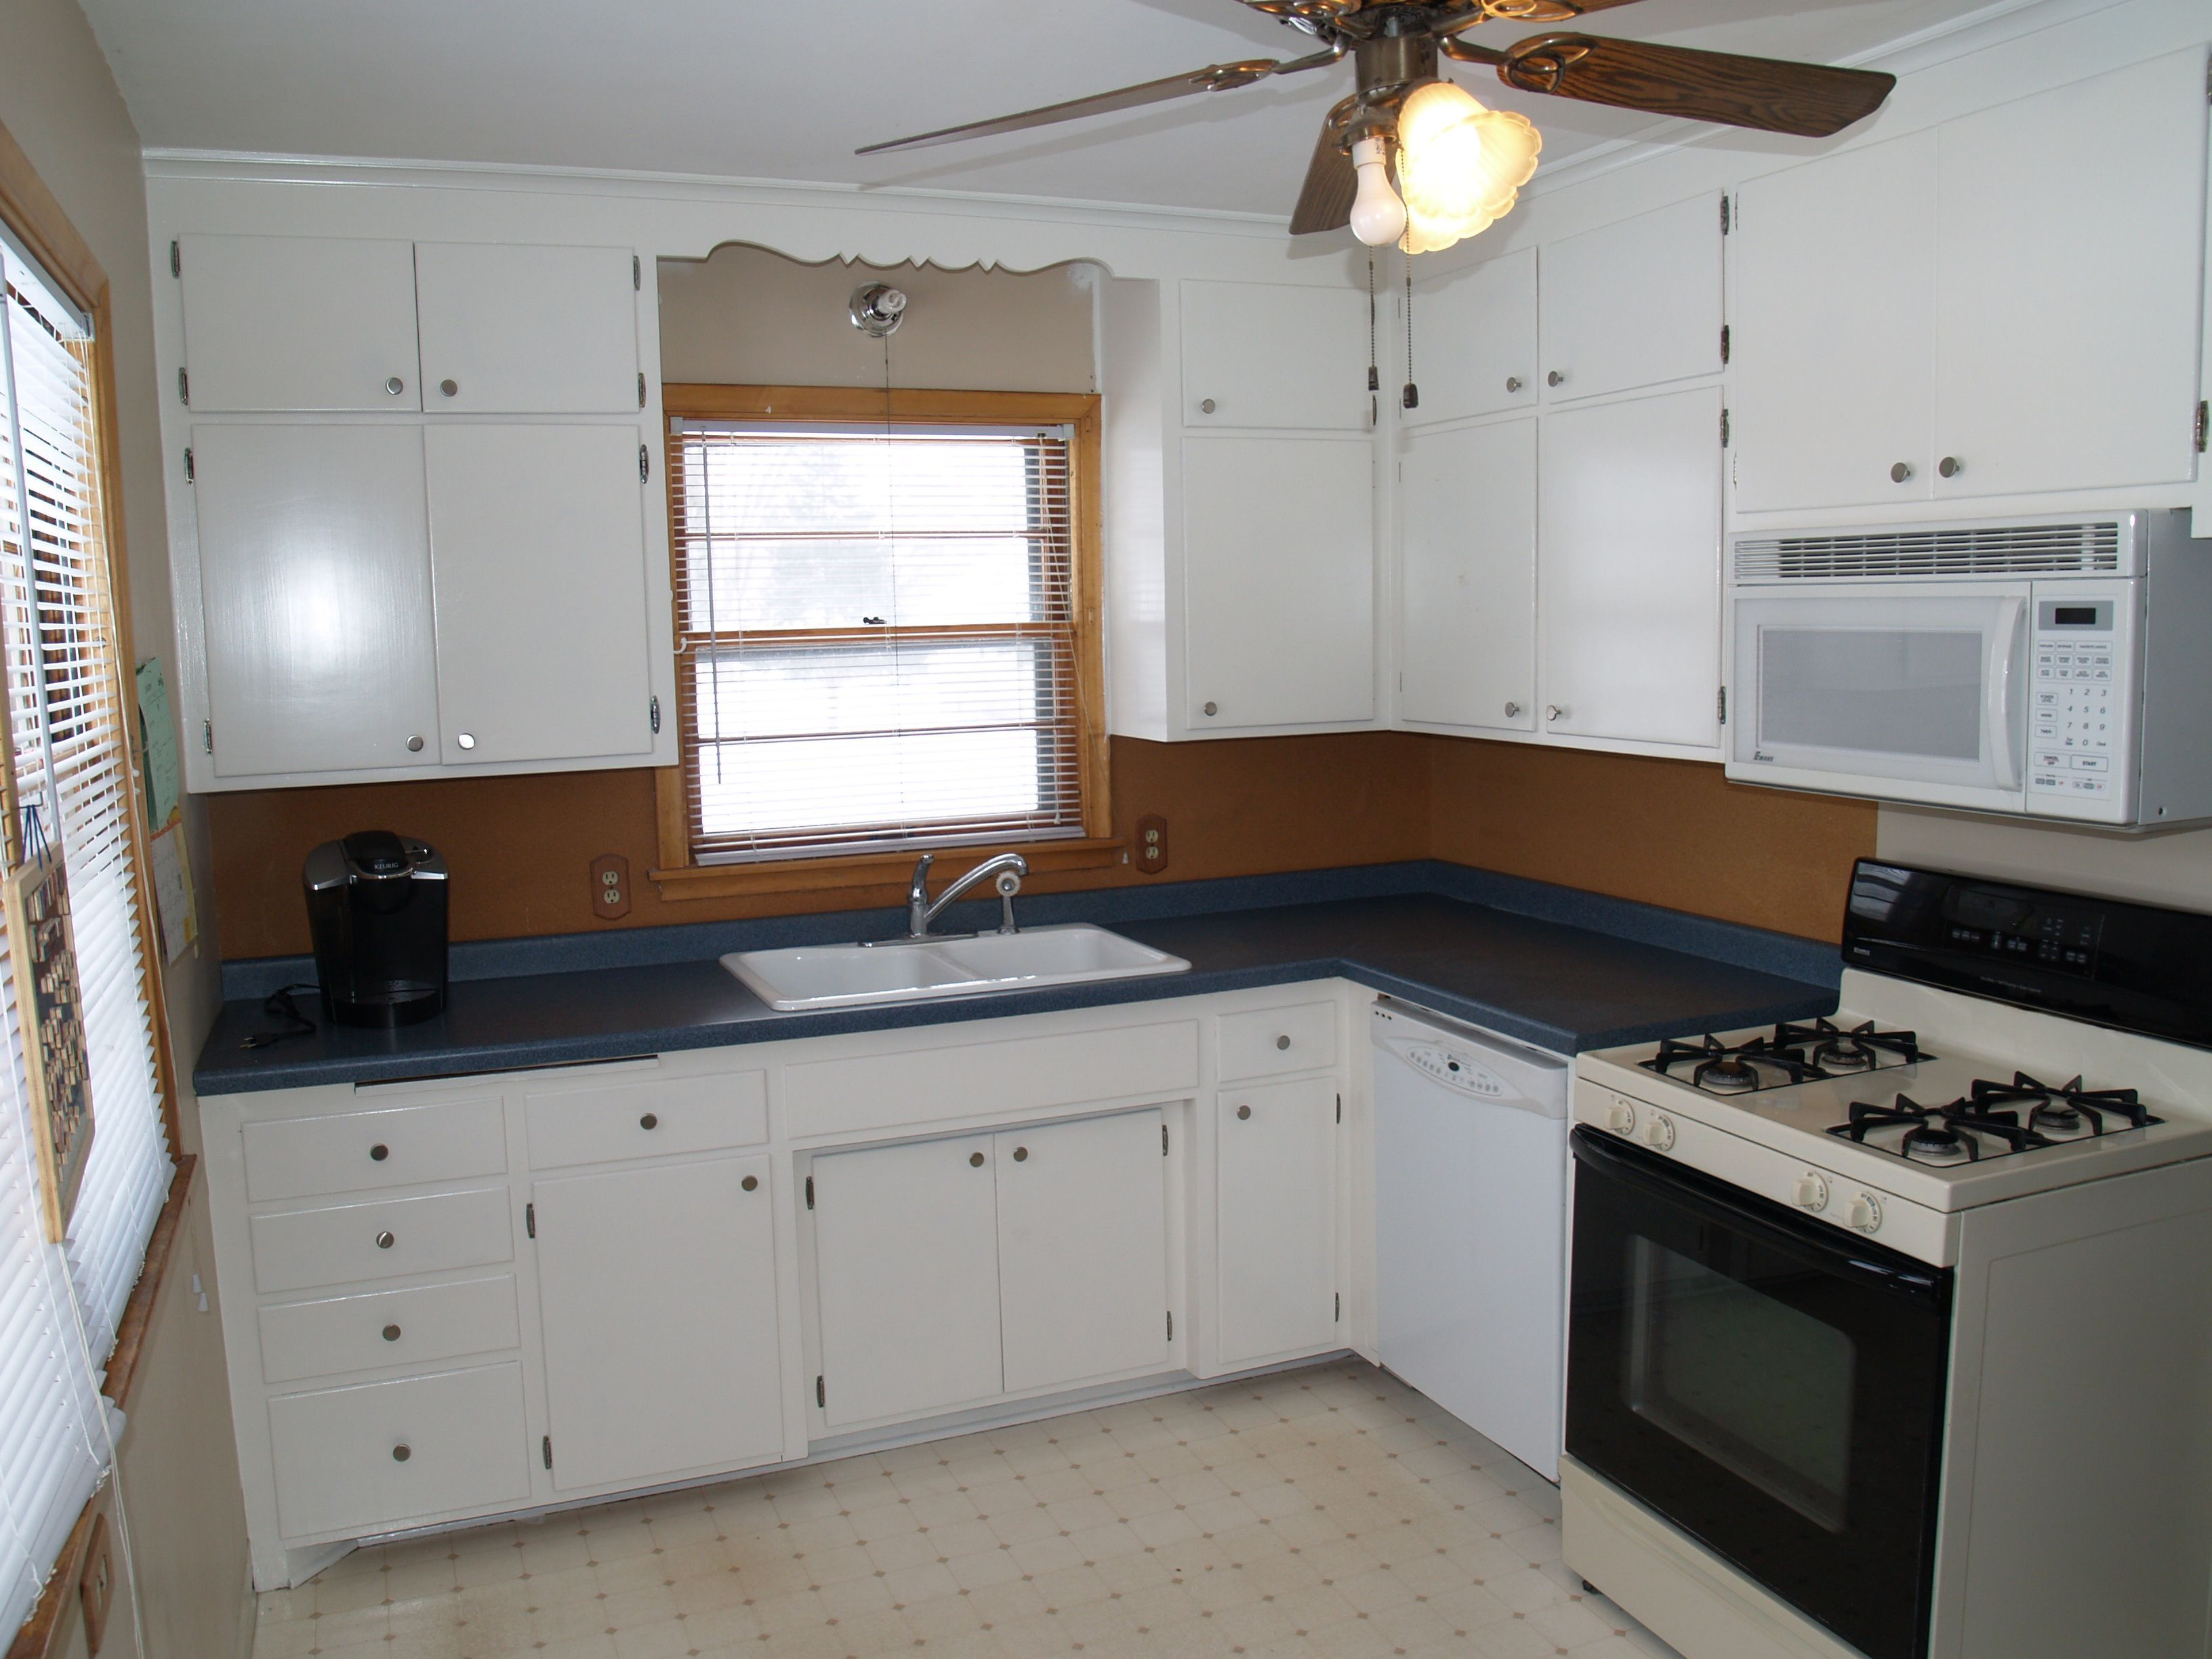 Best Painting Kitchen Idea Cabinets Antique White Old Kitchen 640 x 480